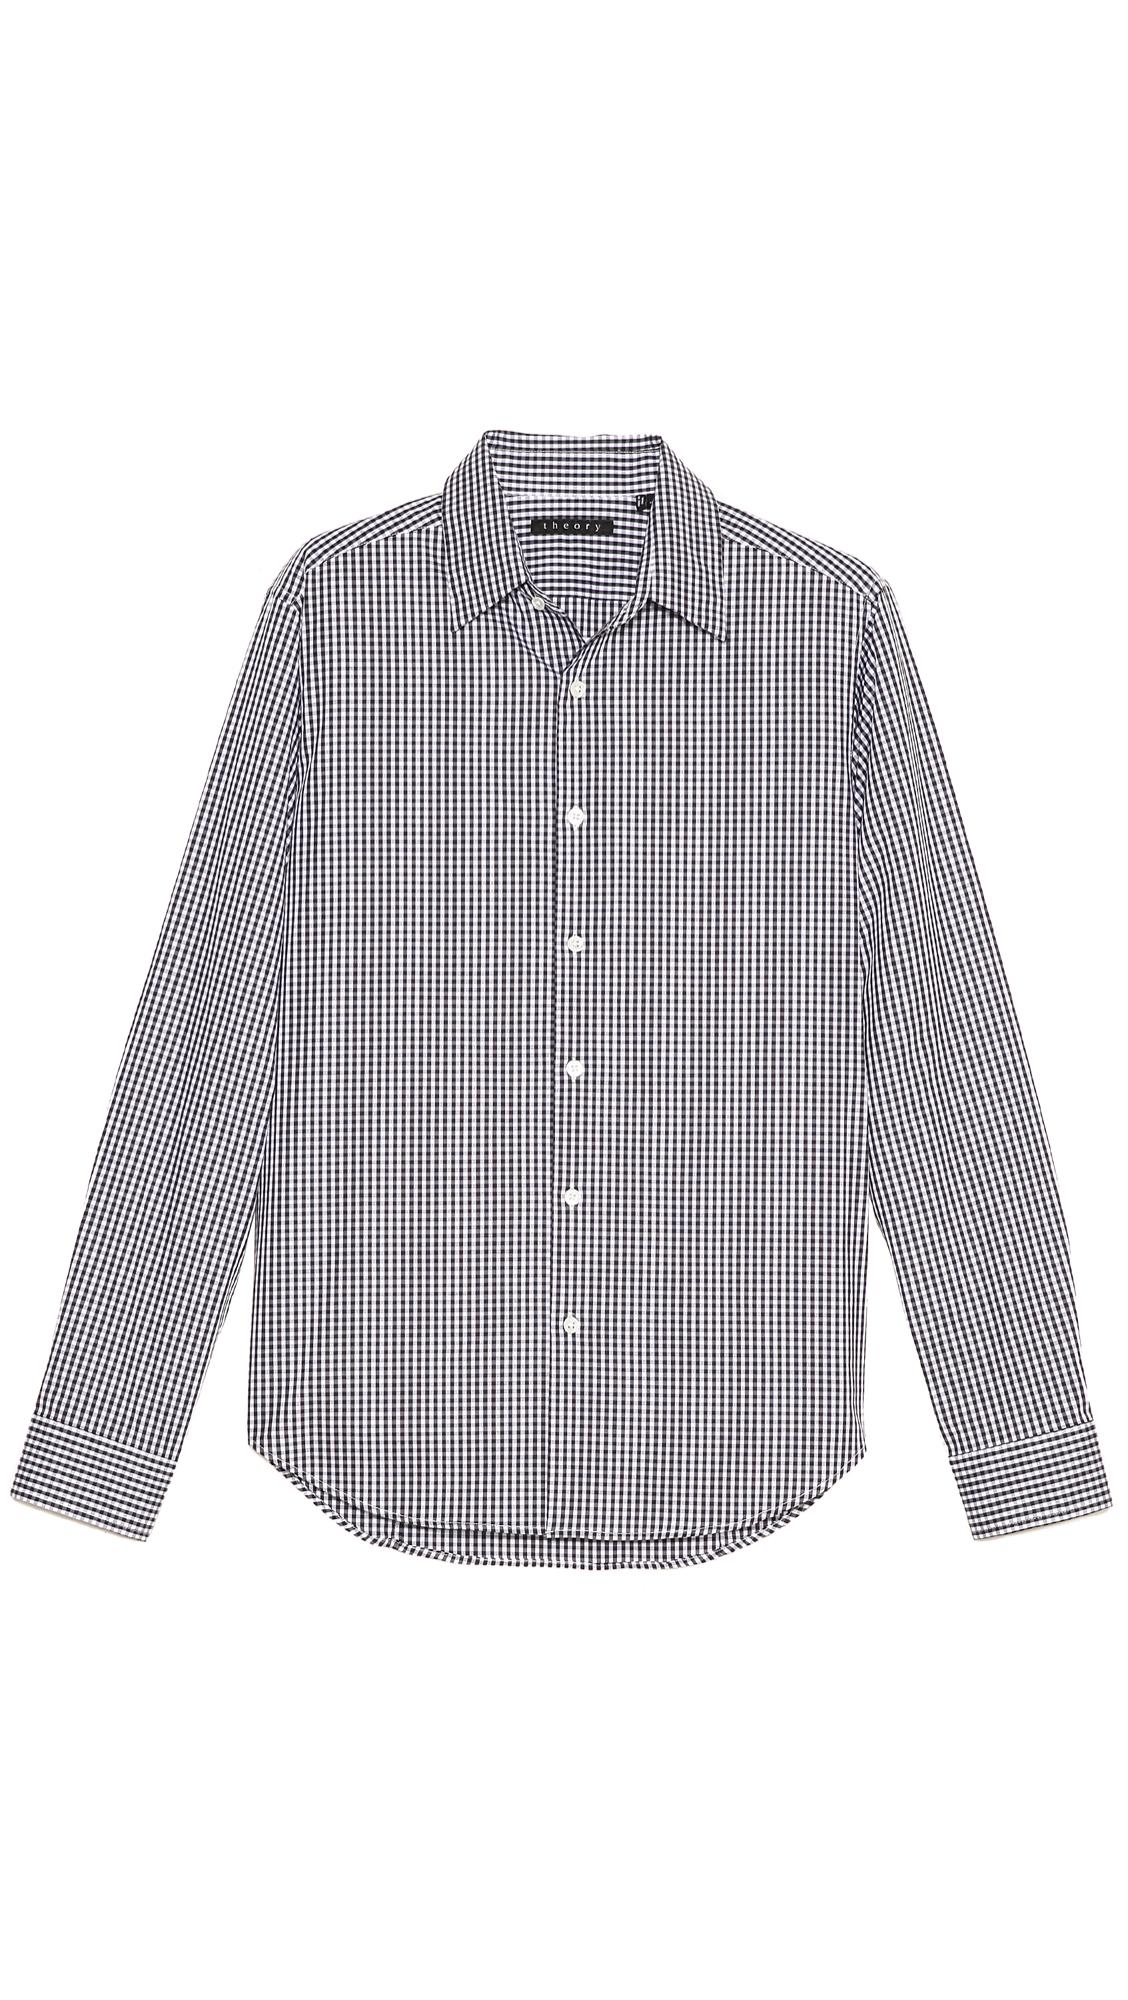 Theory sylvain gingham dress shirt in black for men black for Gingham dress shirt men